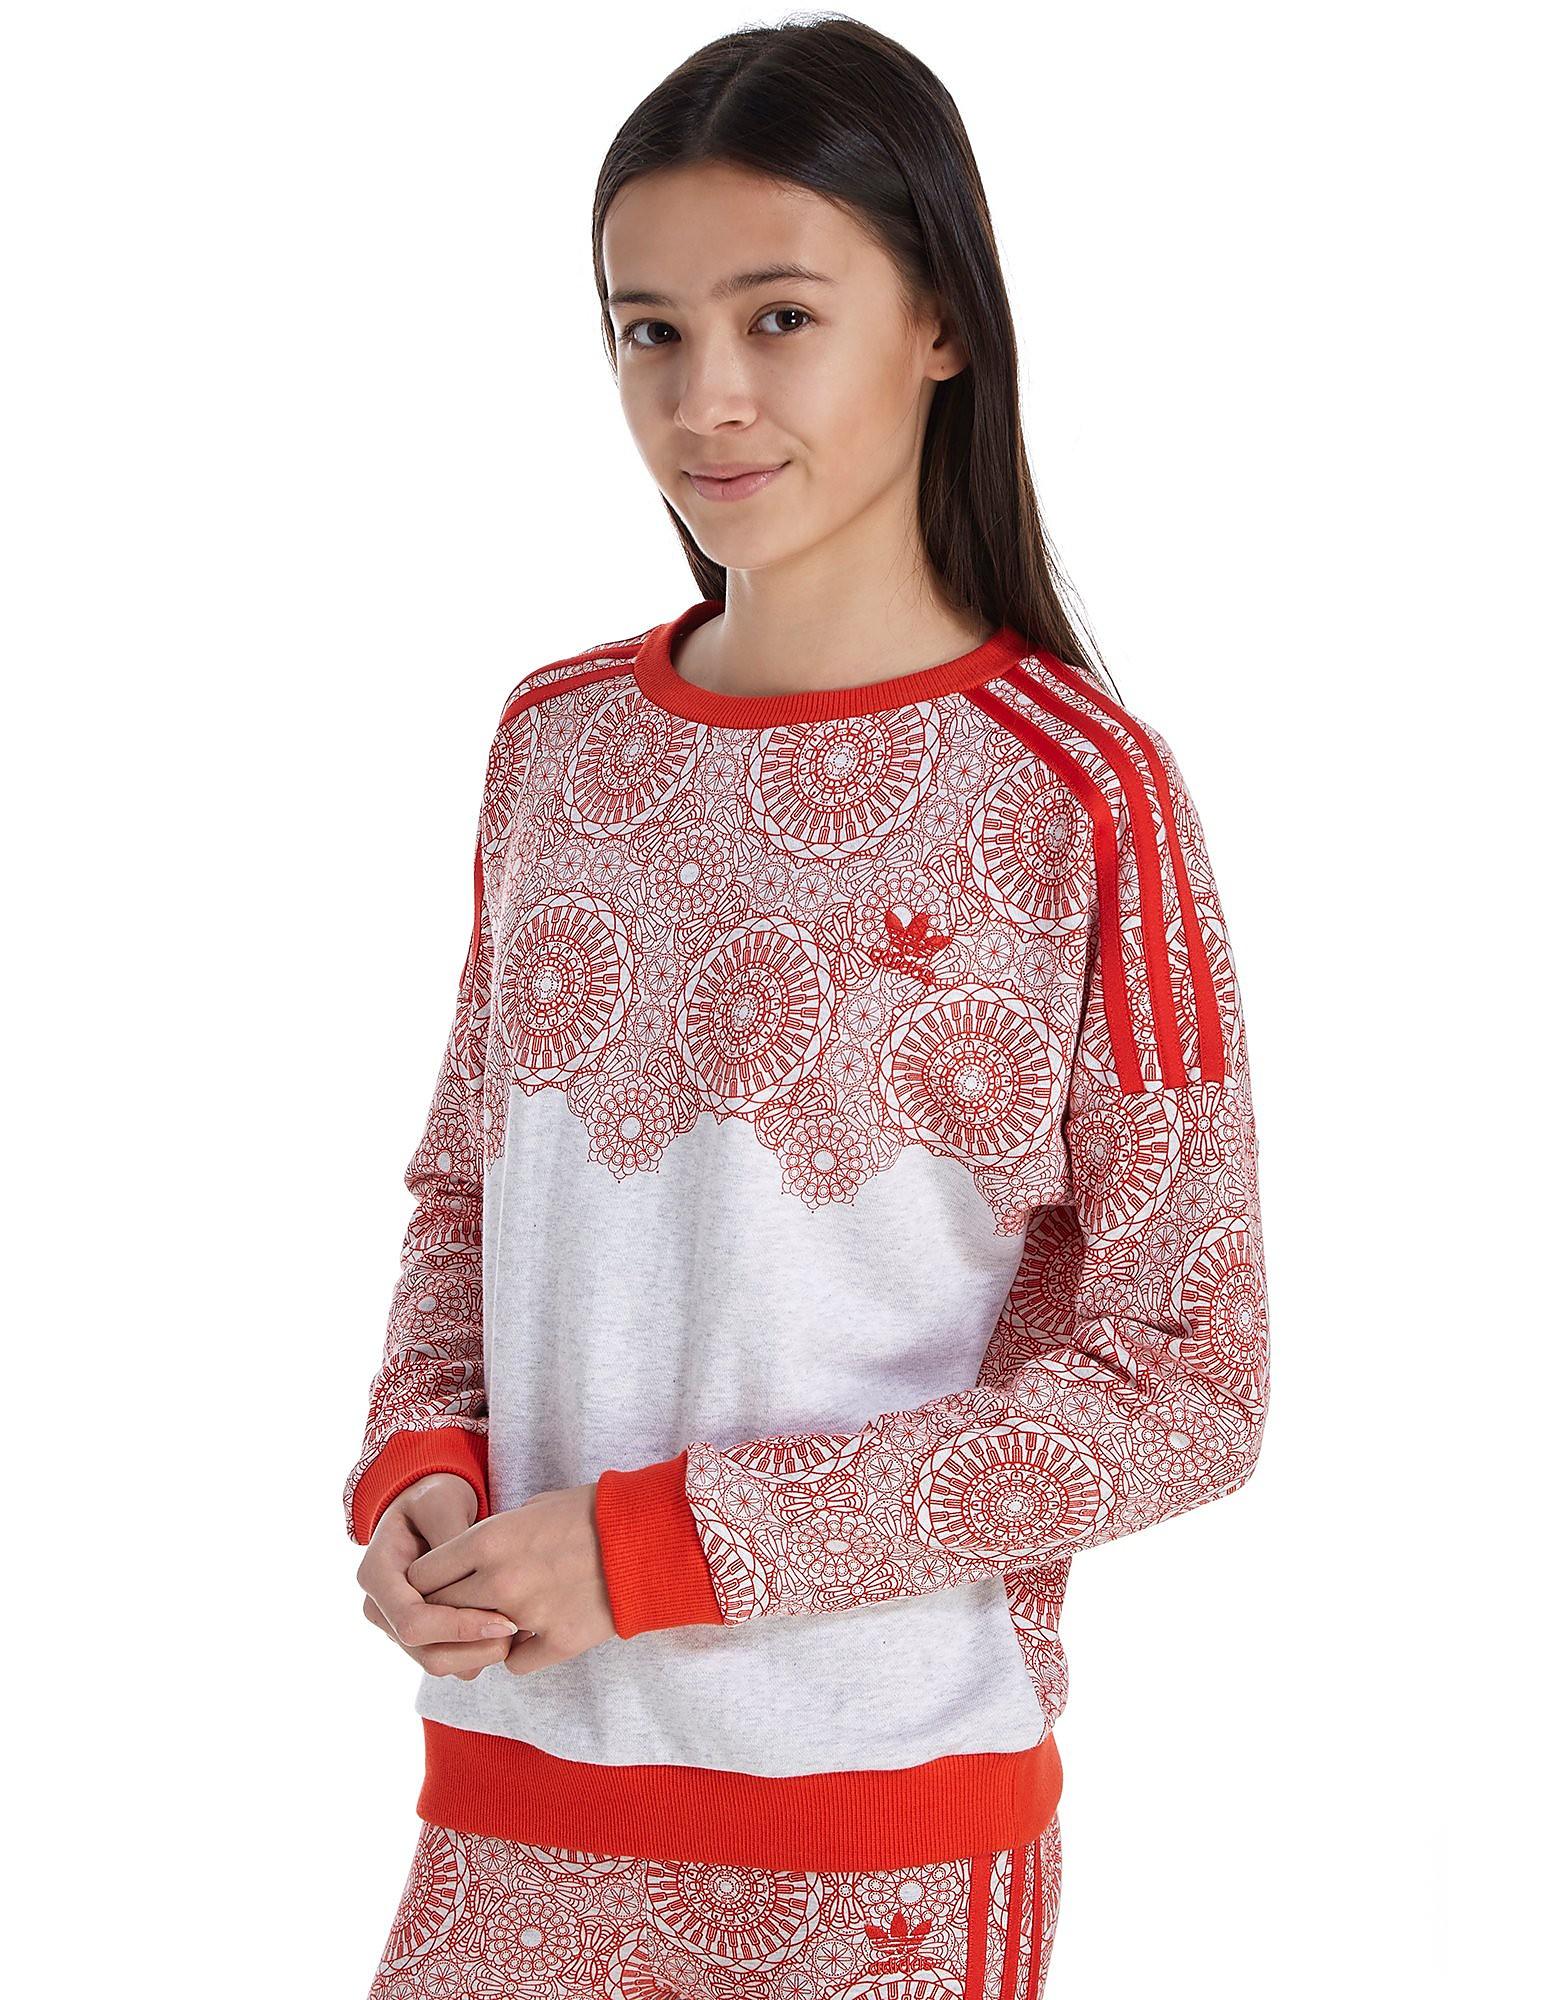 adidas Originals Sweatshirt Girls' London Junior